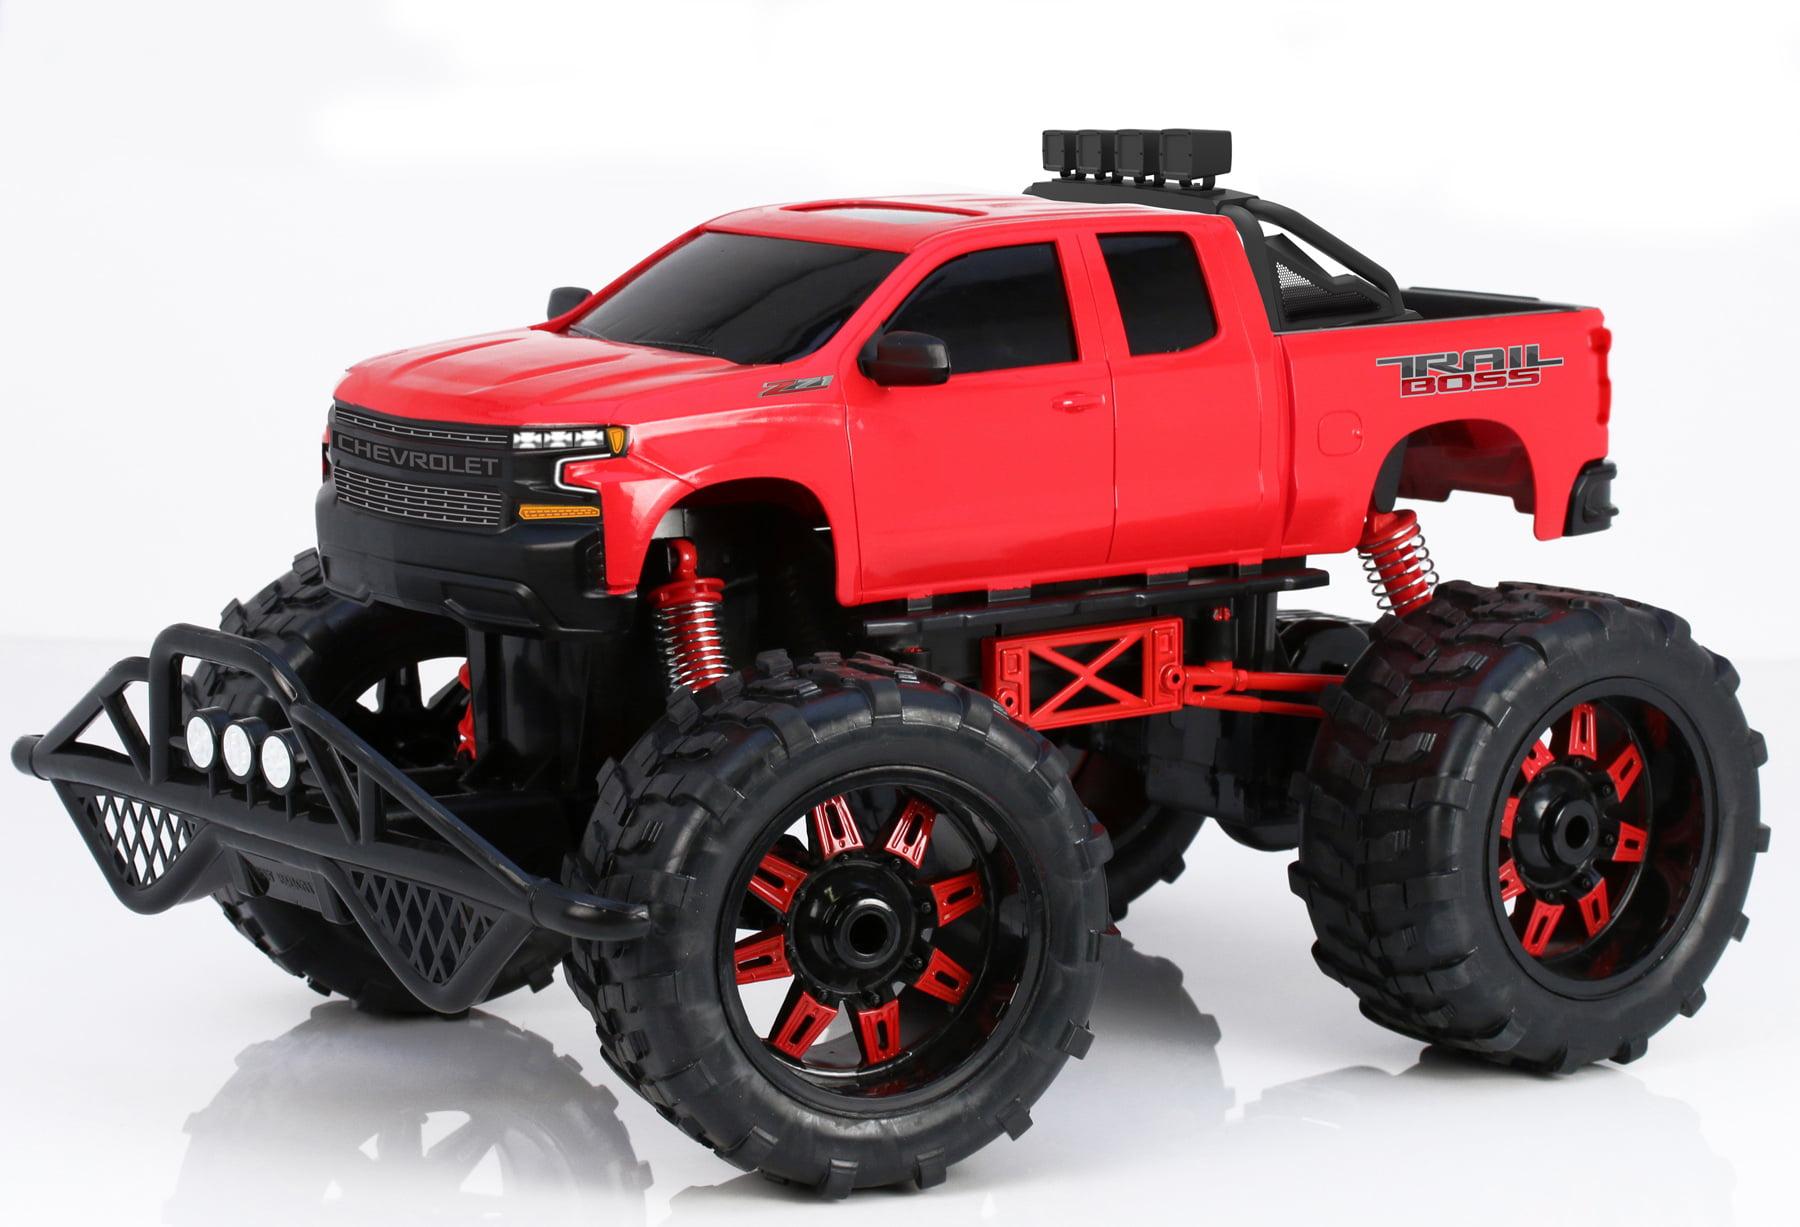 New Bright RC 1:10 Scale Trail Boss Silverado Radio Control Truck- Red by New Bright Industrial Co., Ltd.